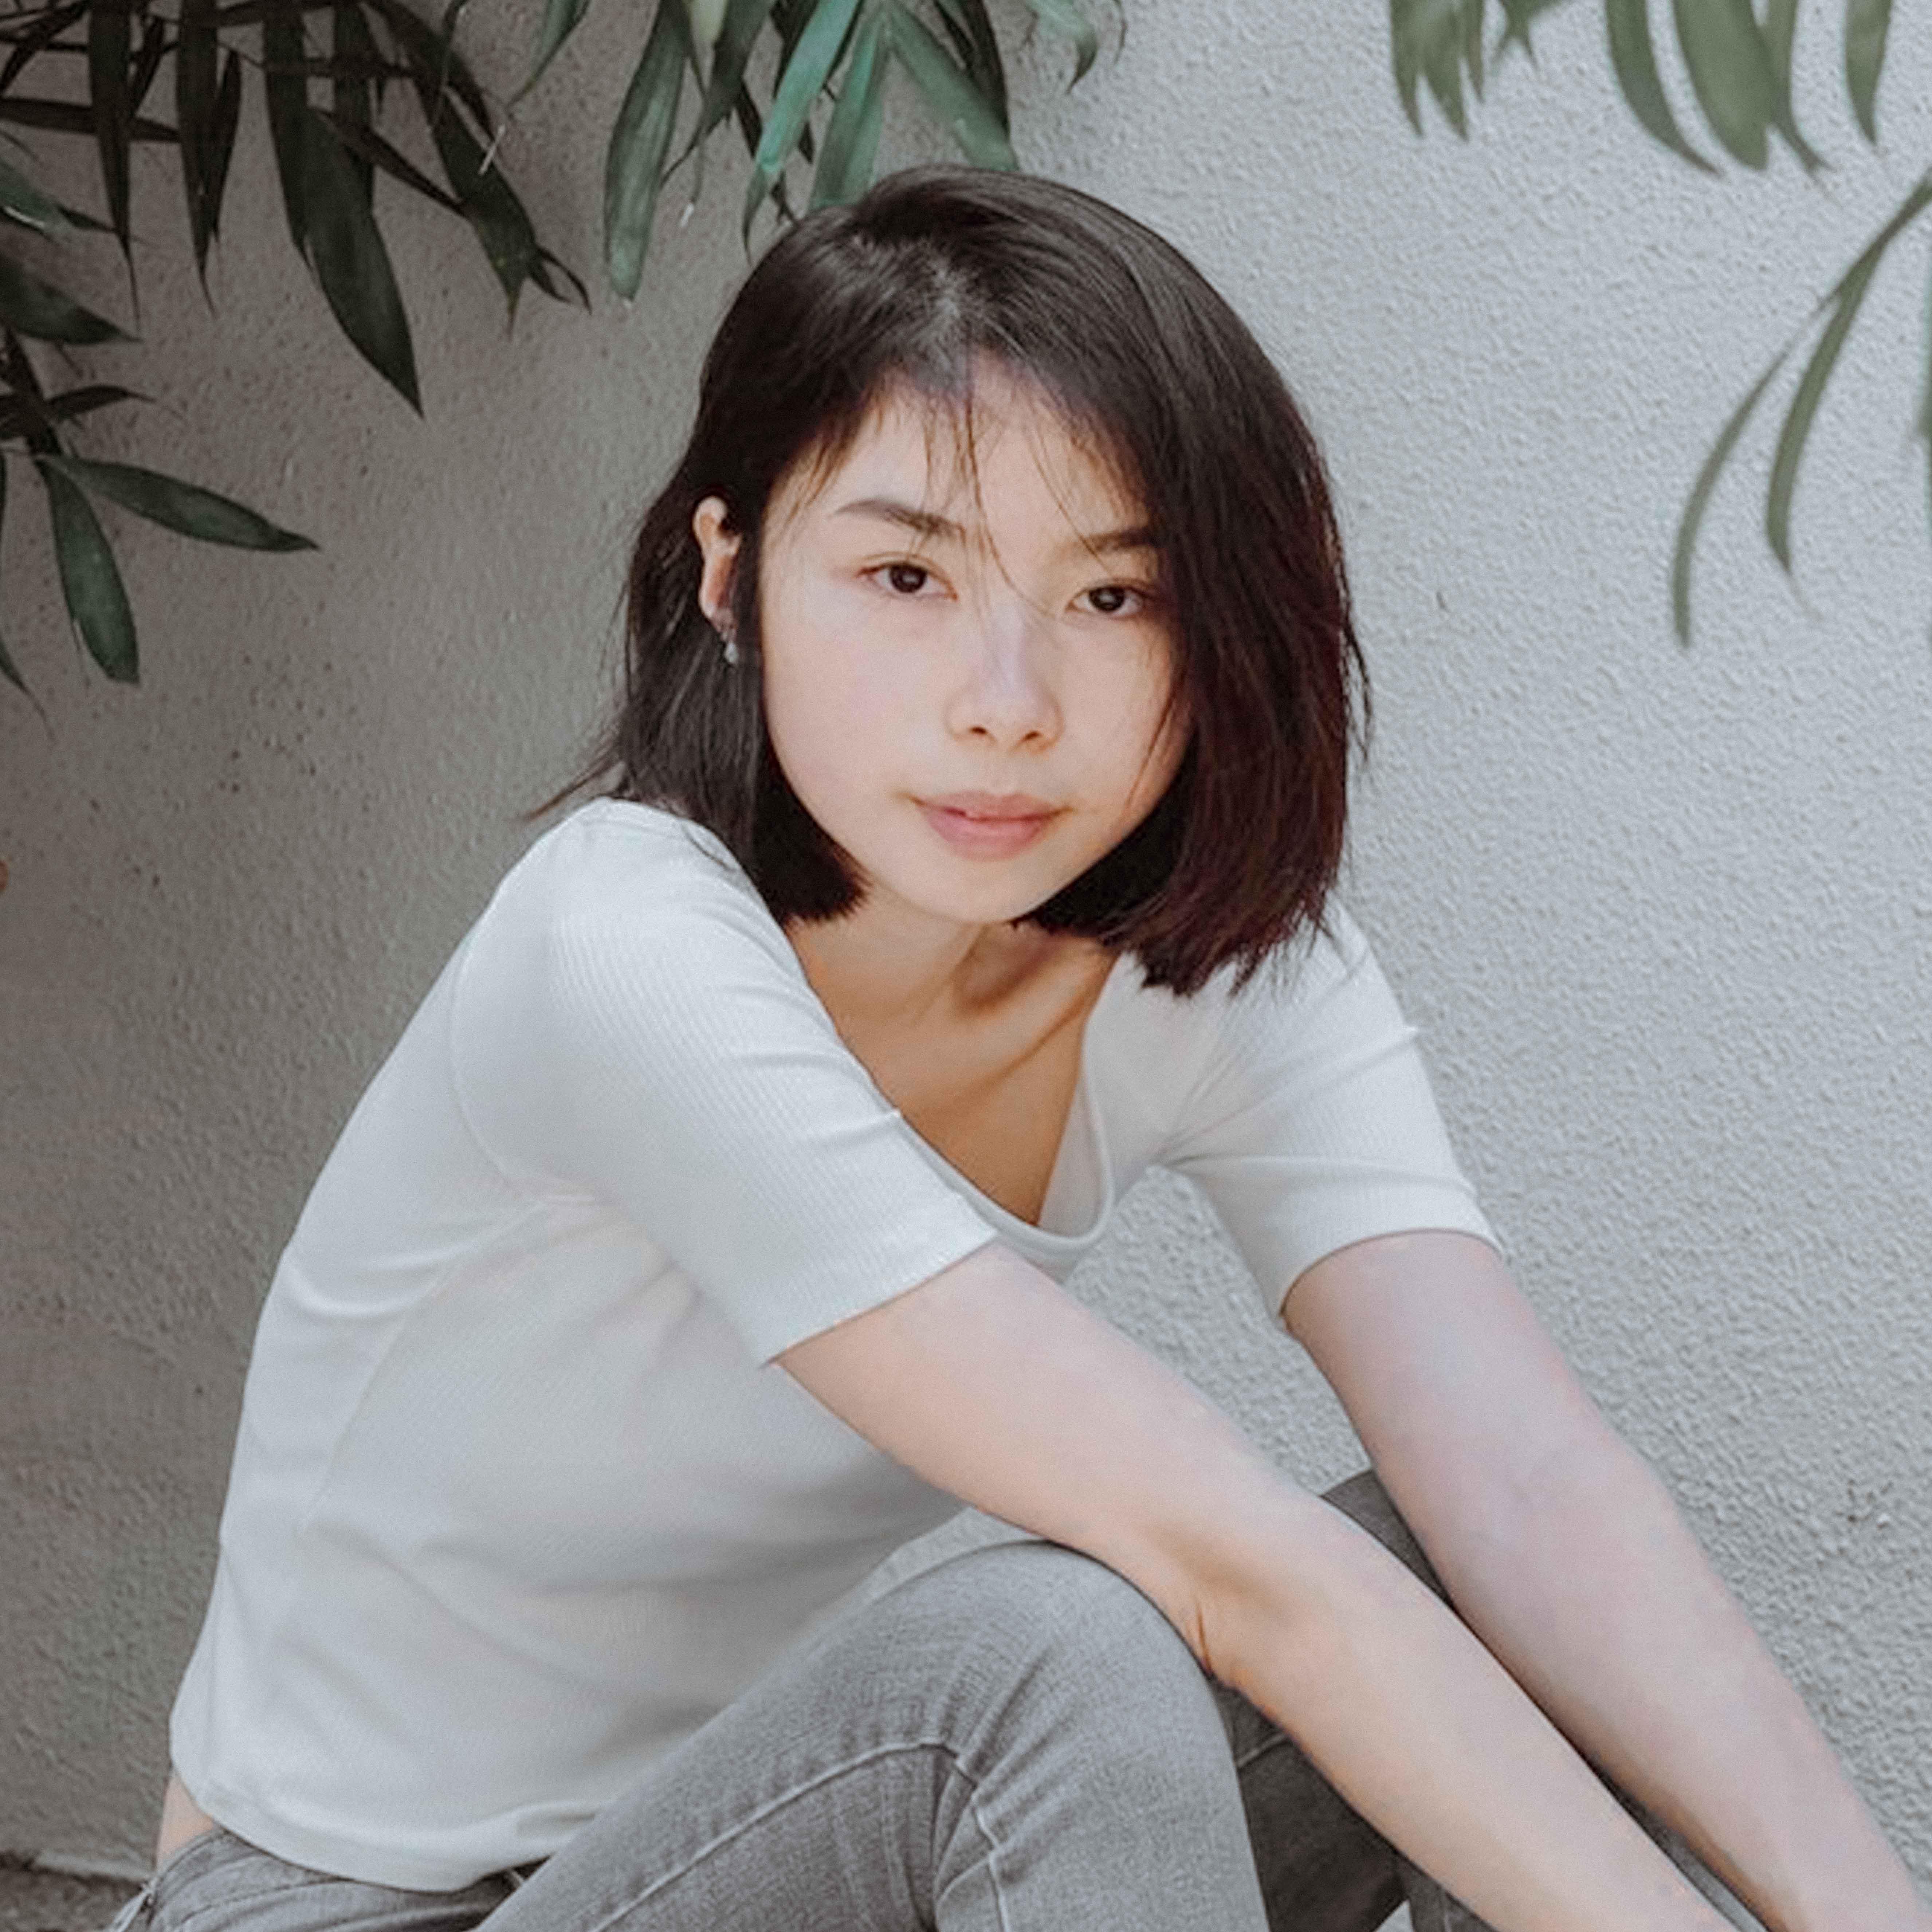 Go to Gabriel Kimikura's profile